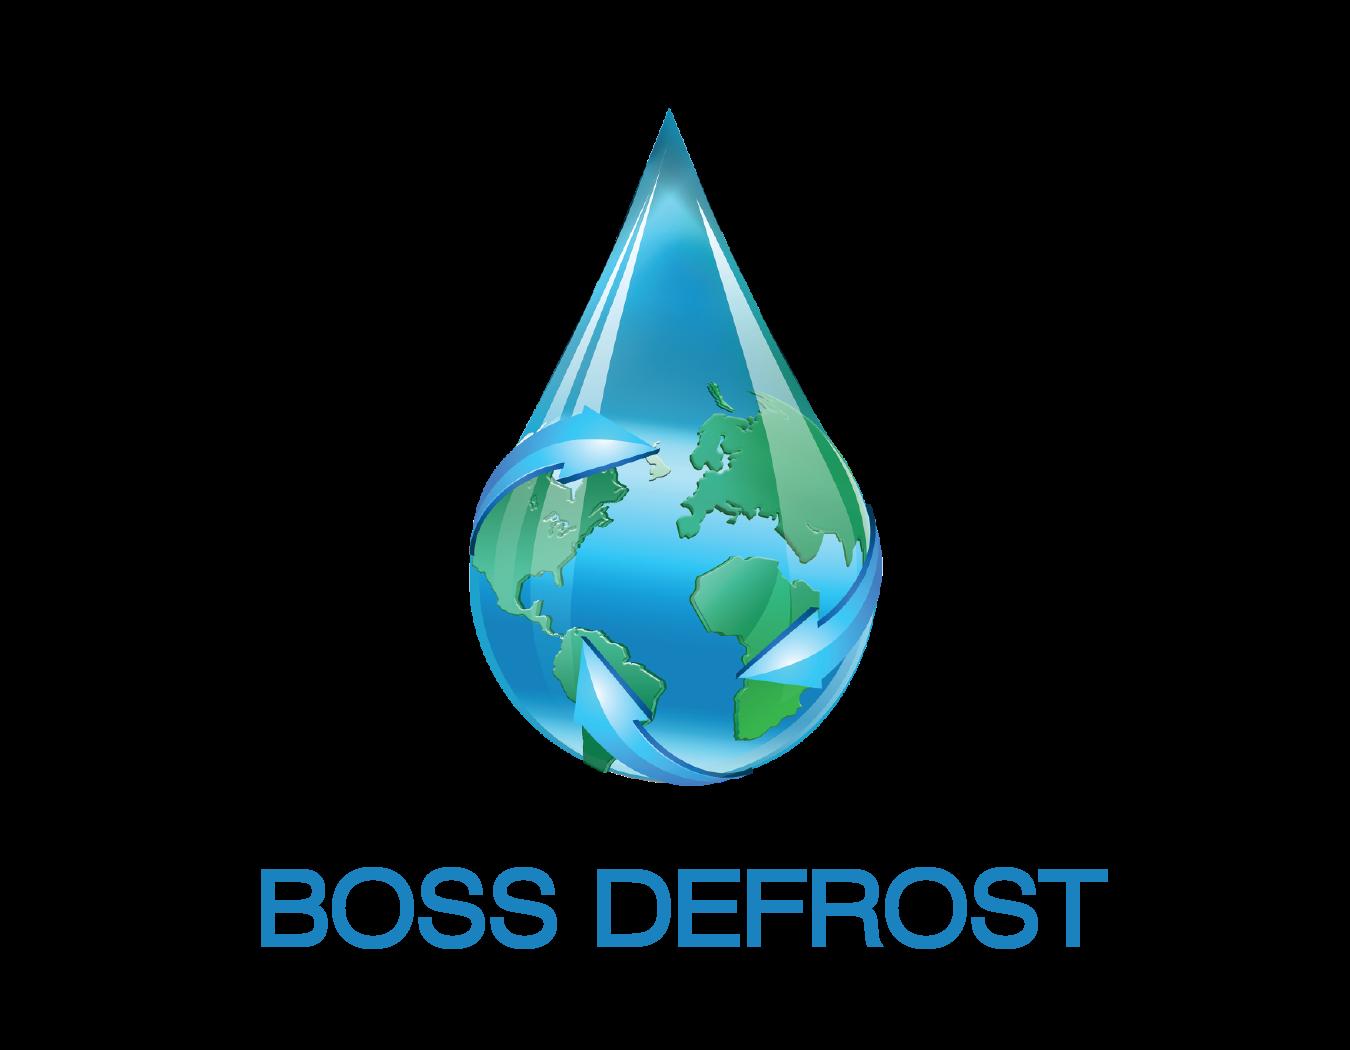 Boss Defrost logo